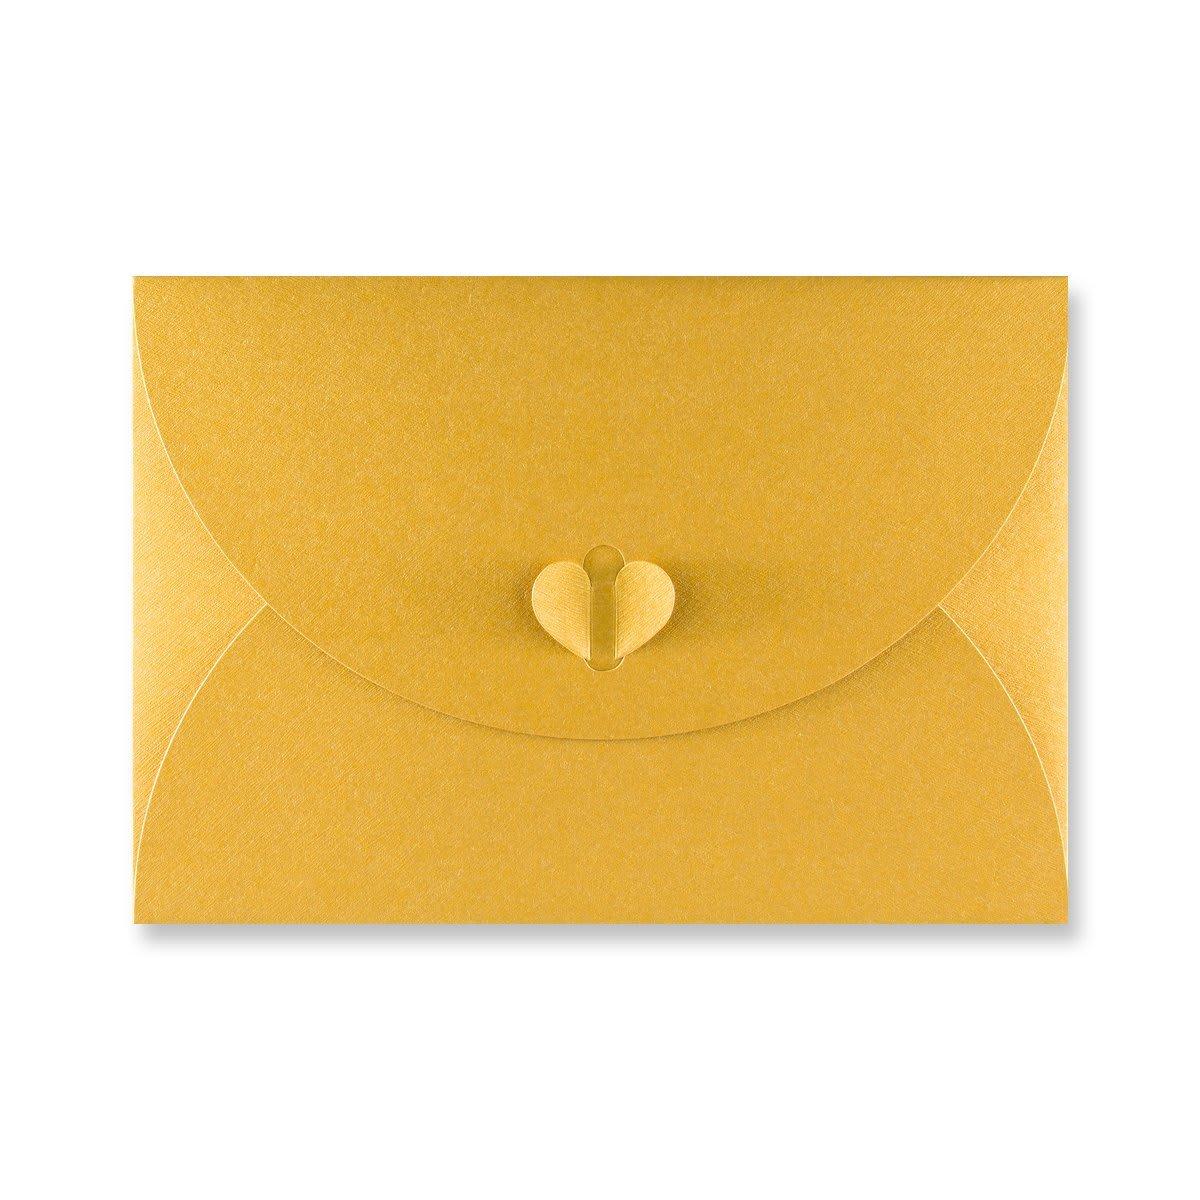 C5 GOLD BUTTERFLY ENVELOPES